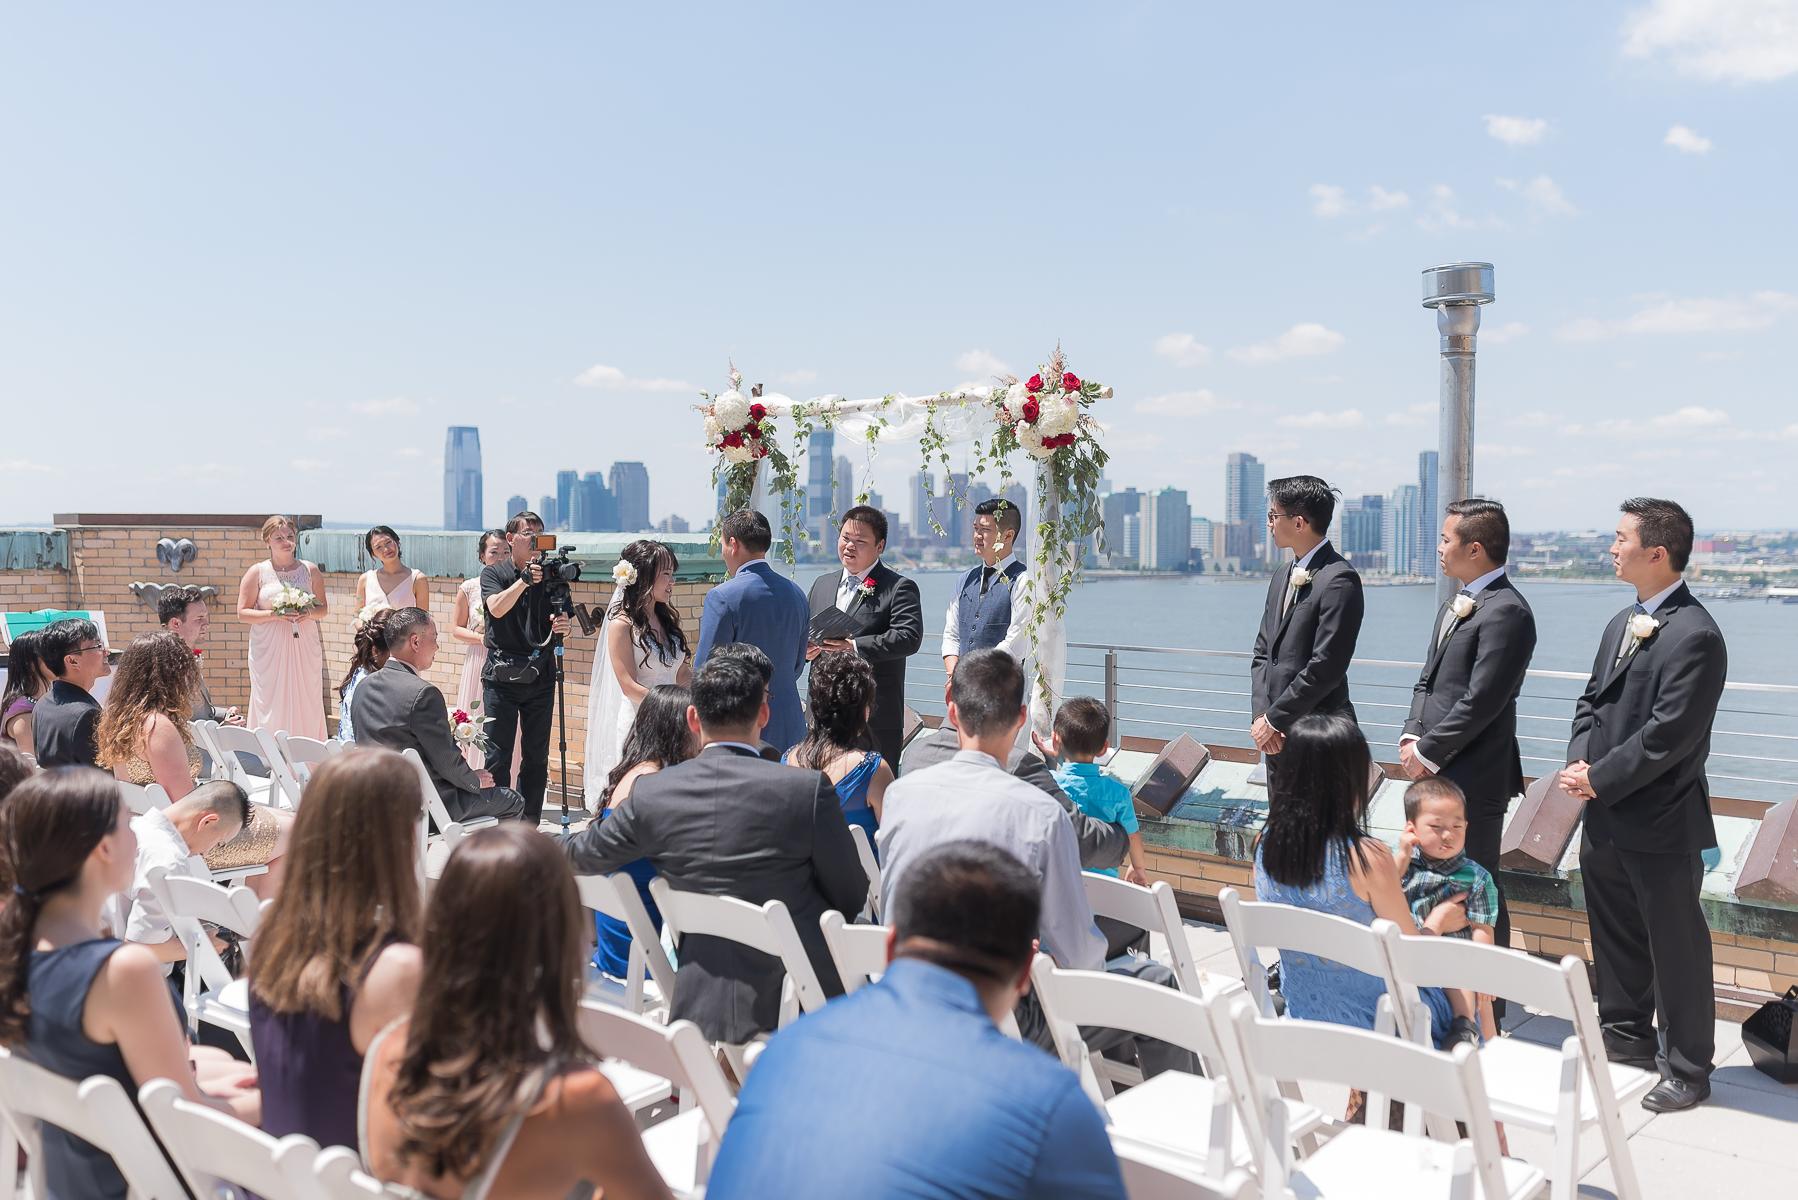 NYC-Ramscale-Wedding-Ceremony-Overview.jpg